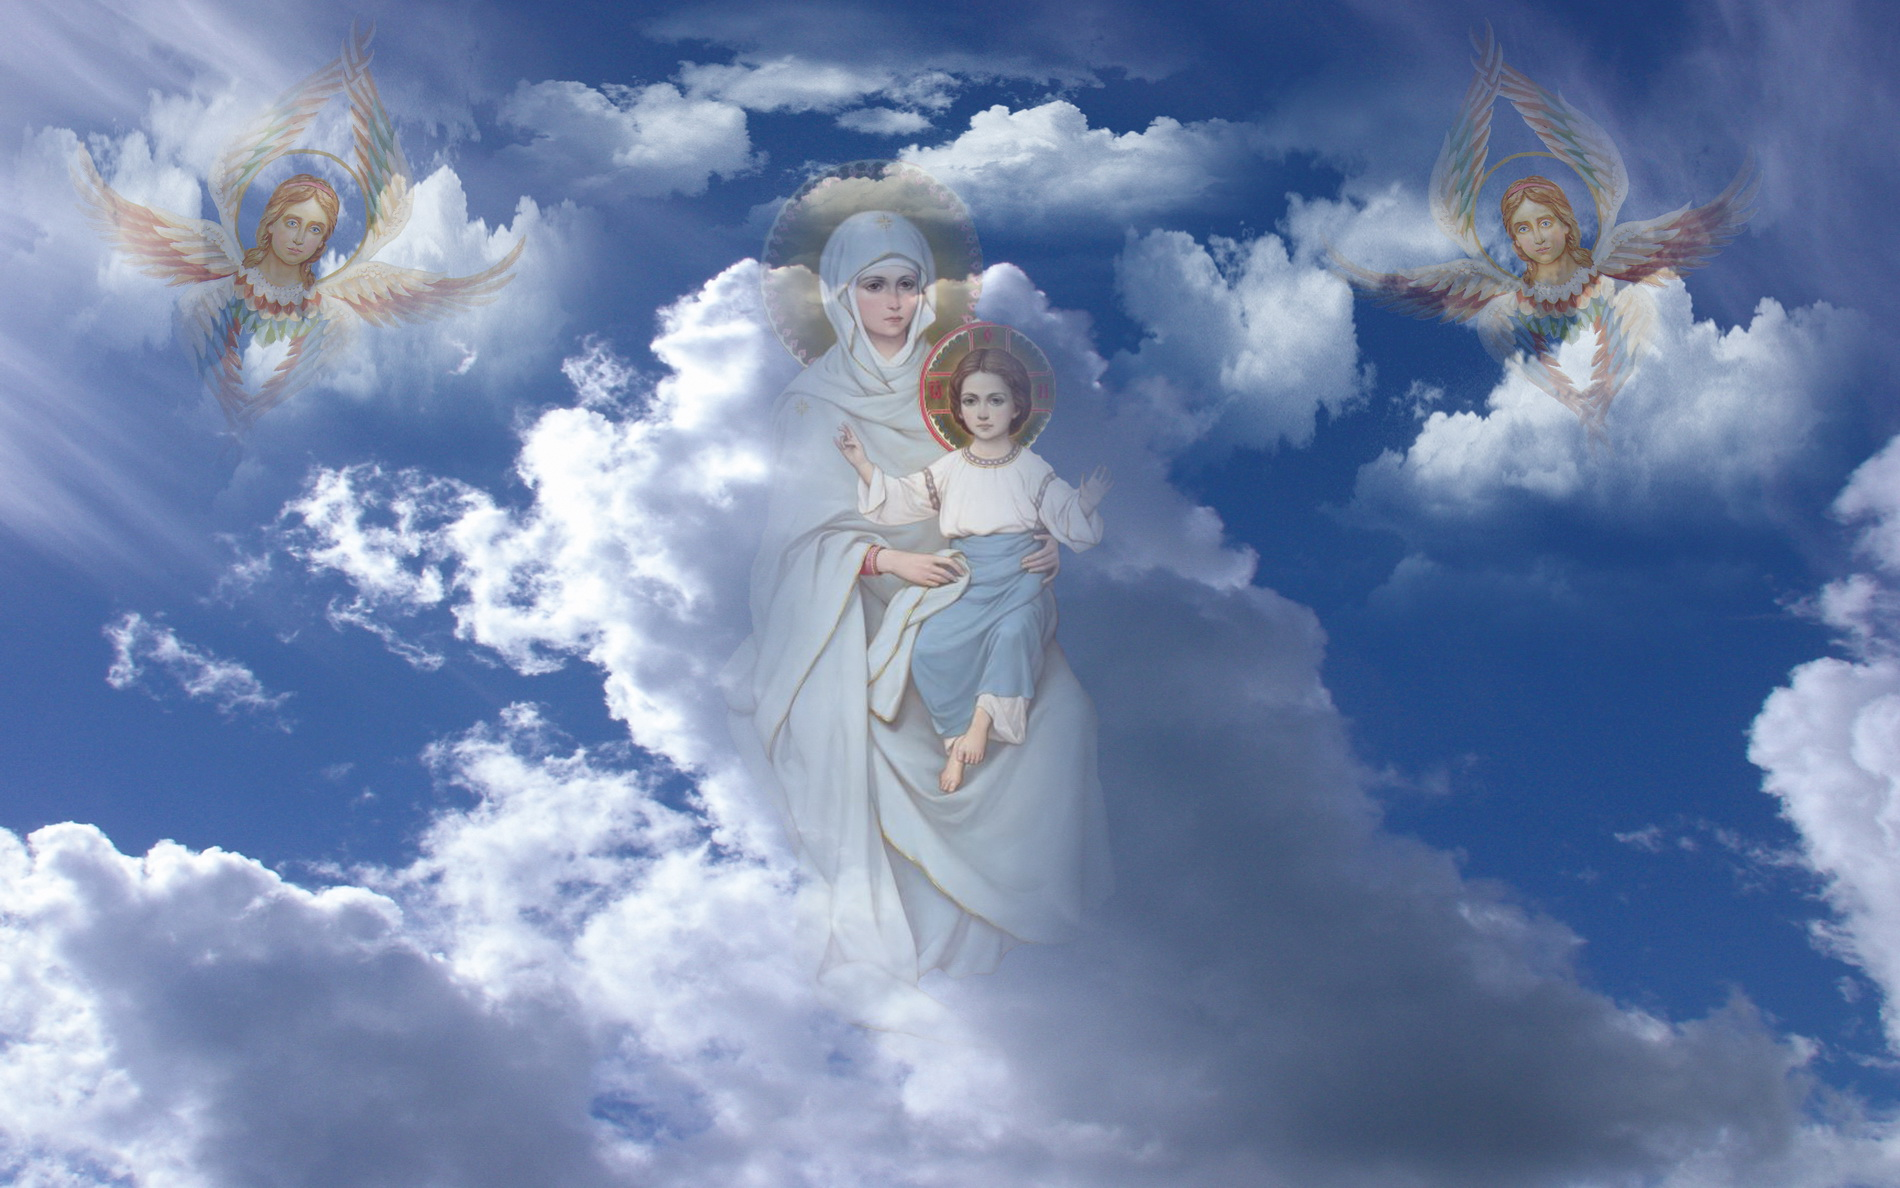 Явлення на небі фото 6 фотография